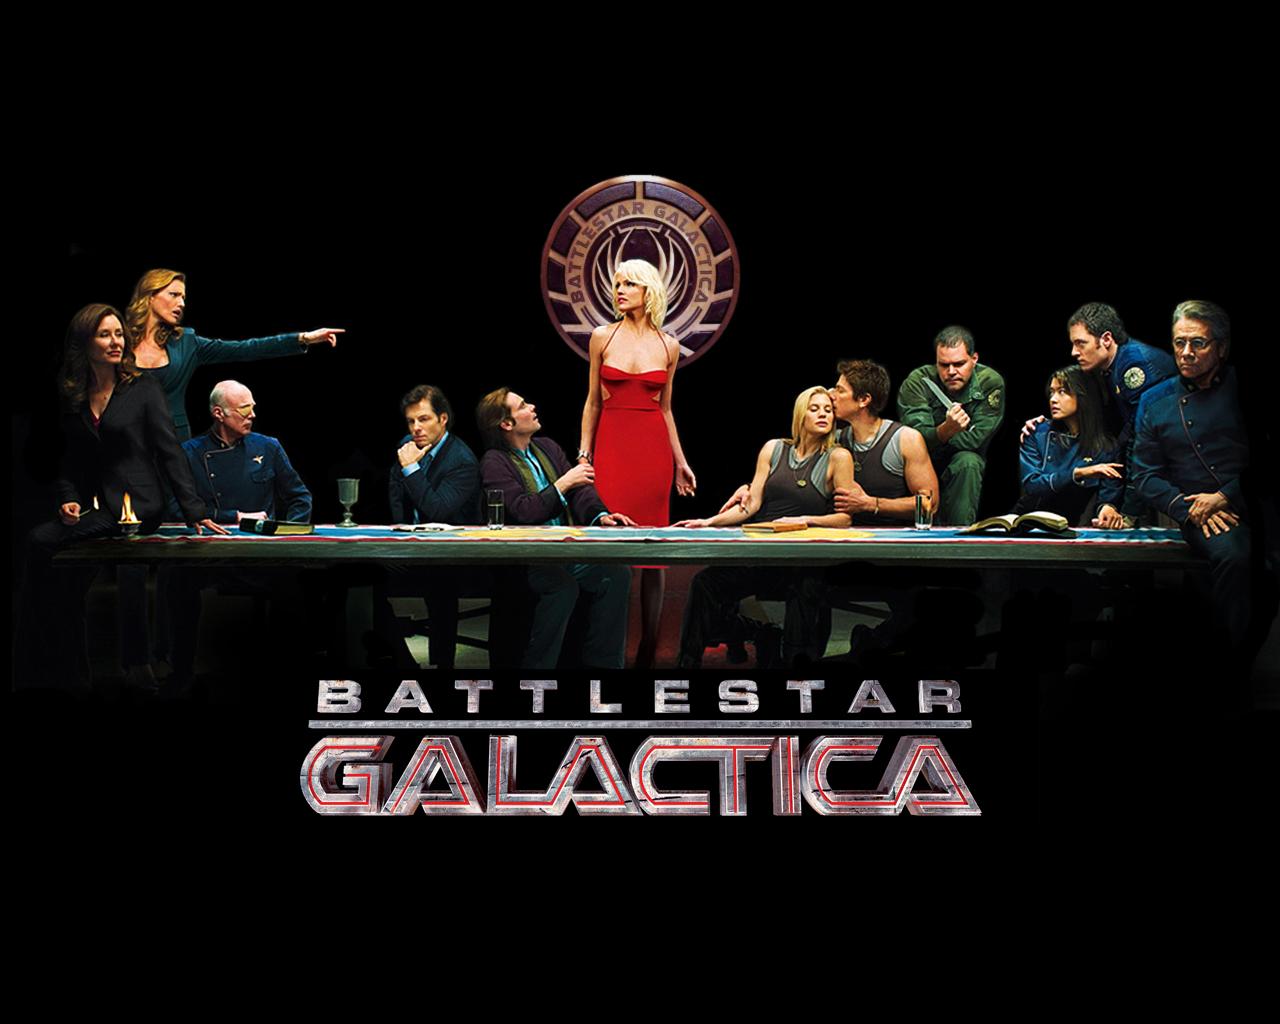 battlestar-galactica-w1